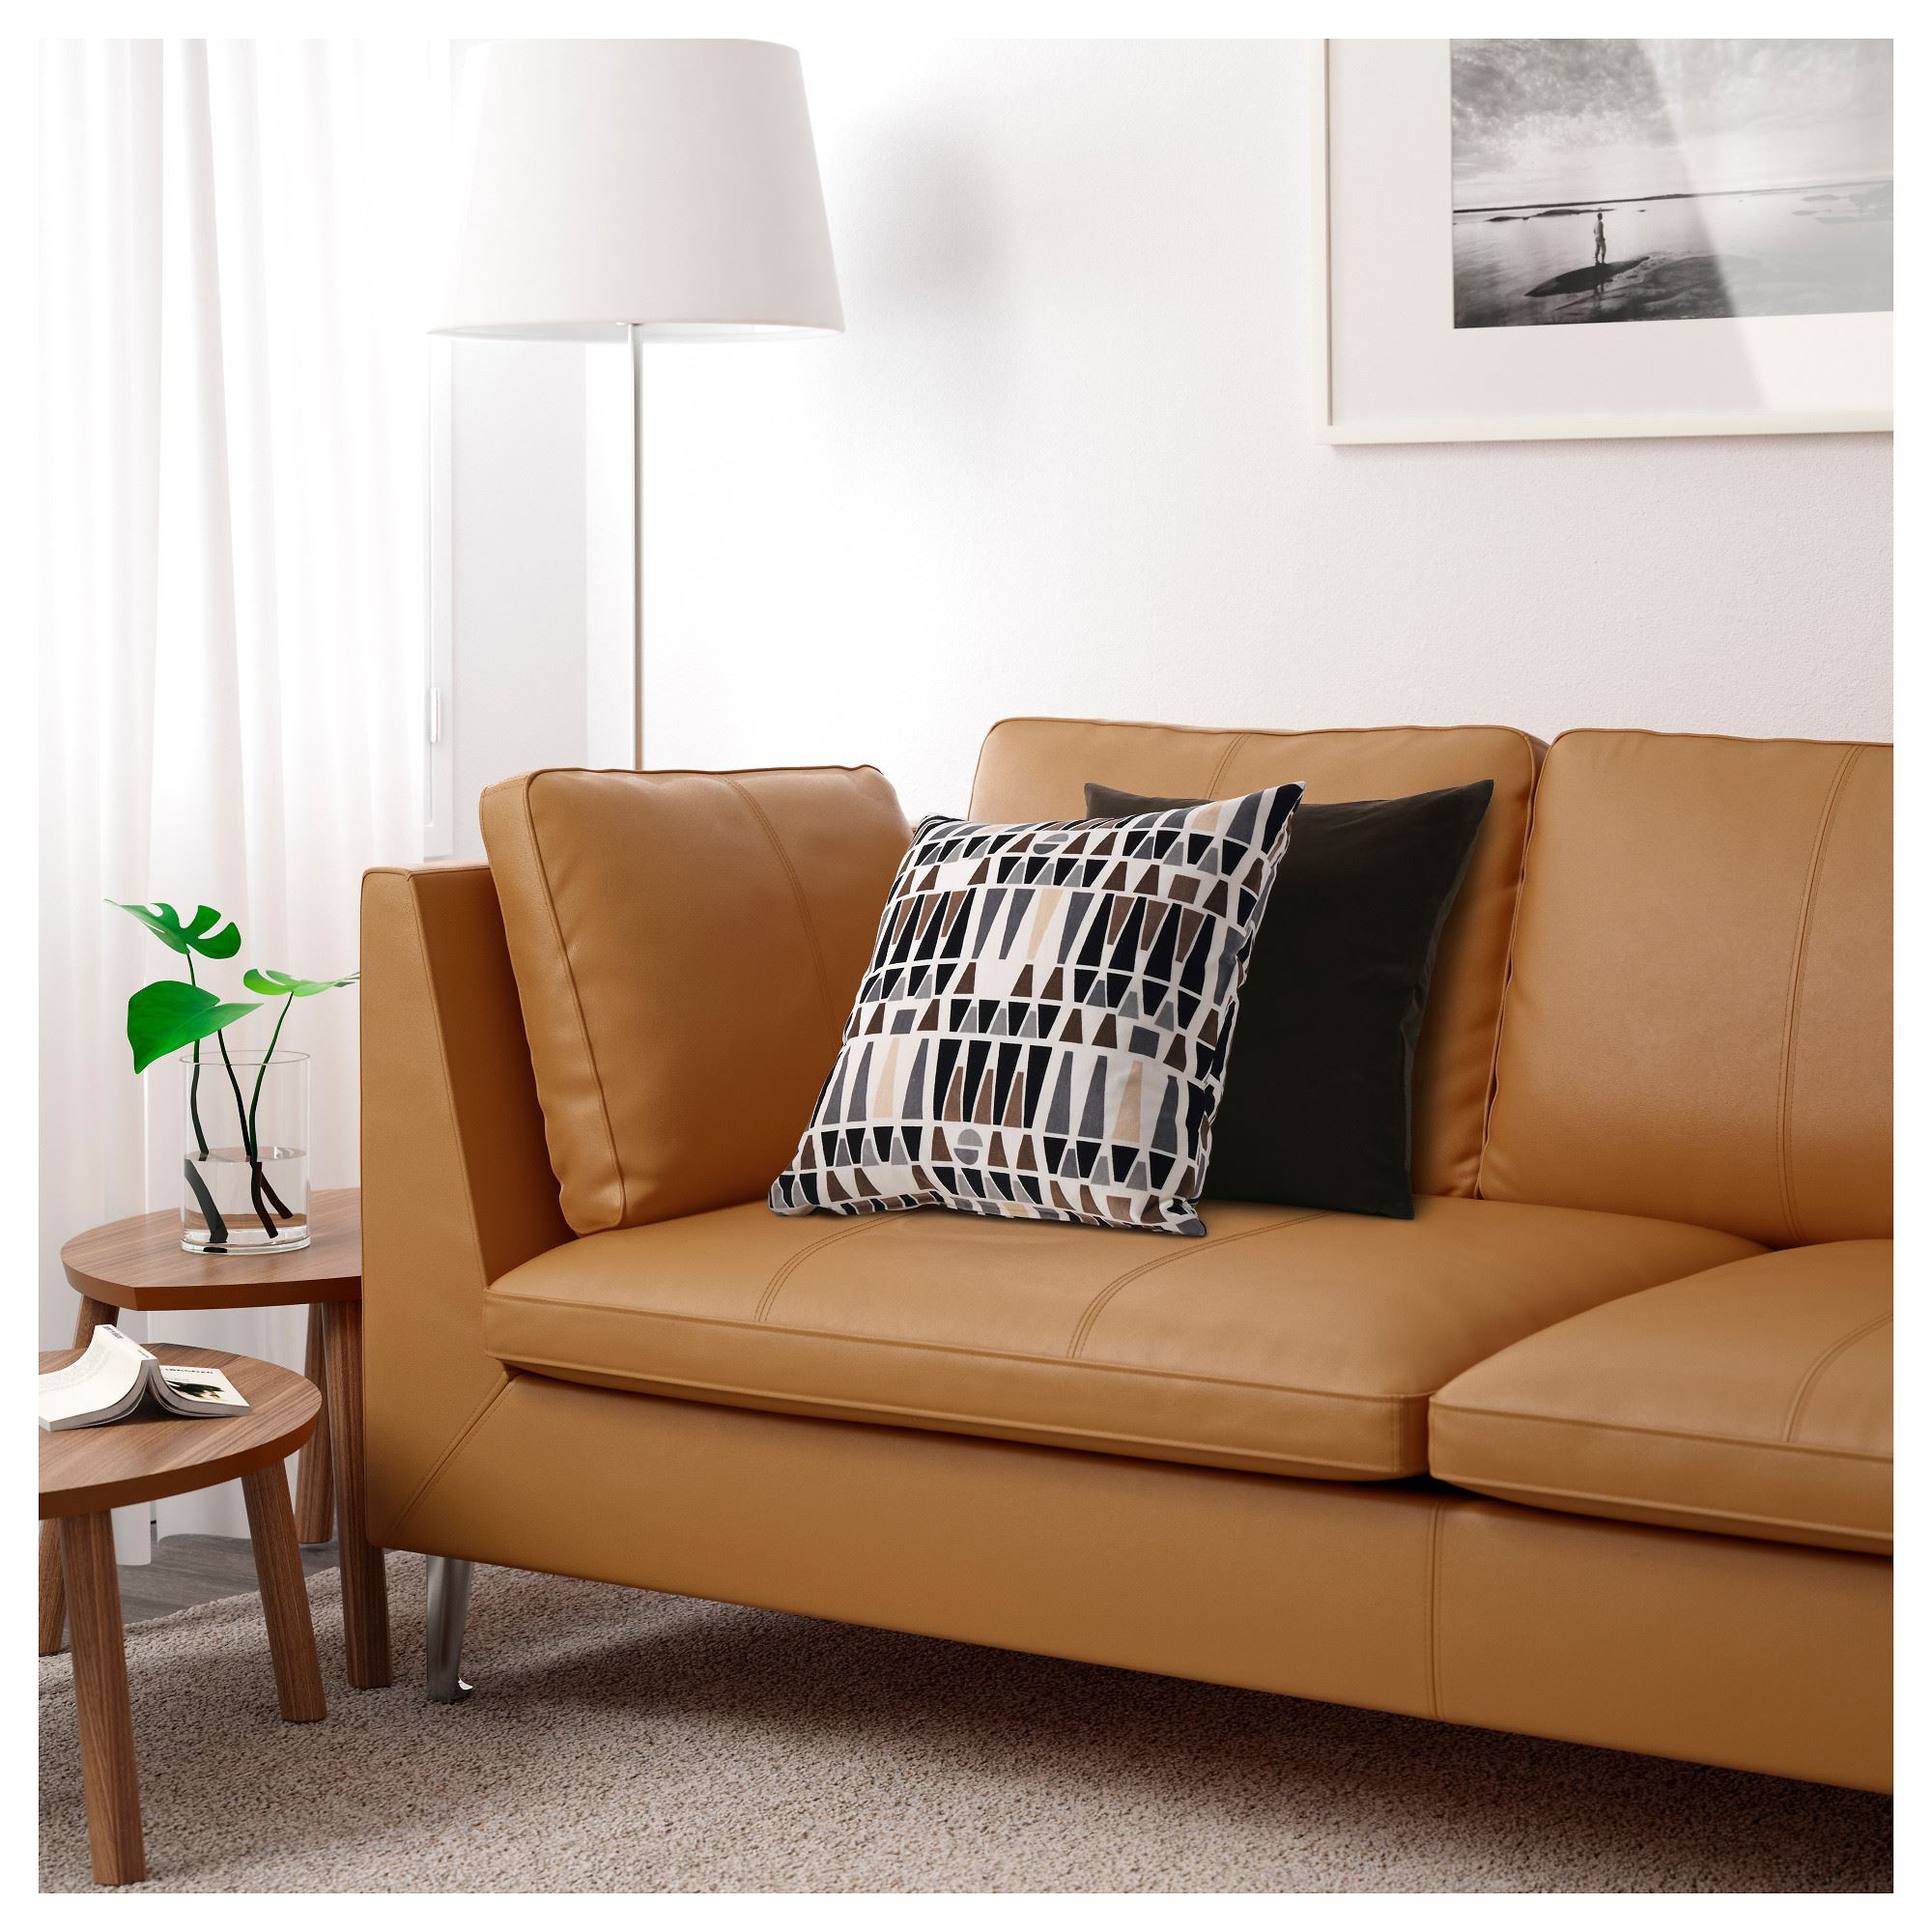 Stockholm, 3 Seat Leather Sofa, Seglora Natural Regarding 3 Seater Leather Sofas (View 7 of 15)